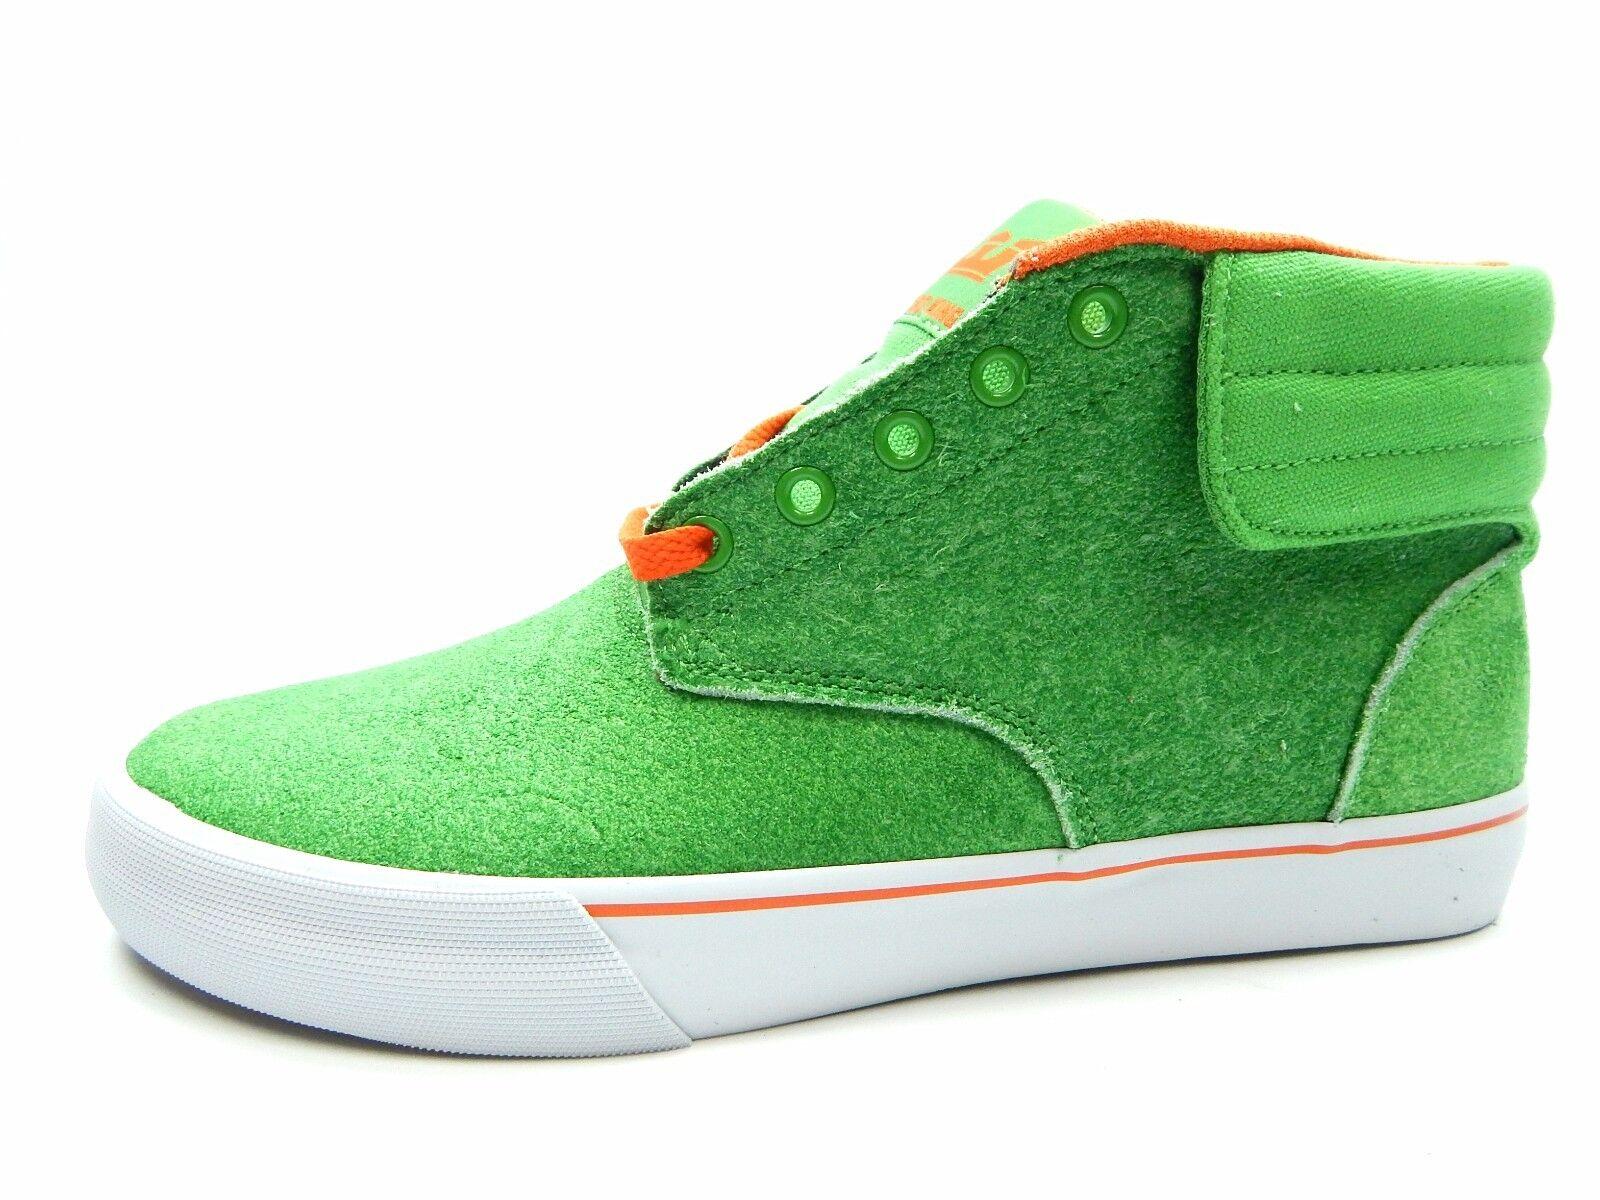 Supra Passion verde Naranja blancooo Zapatos para hombres